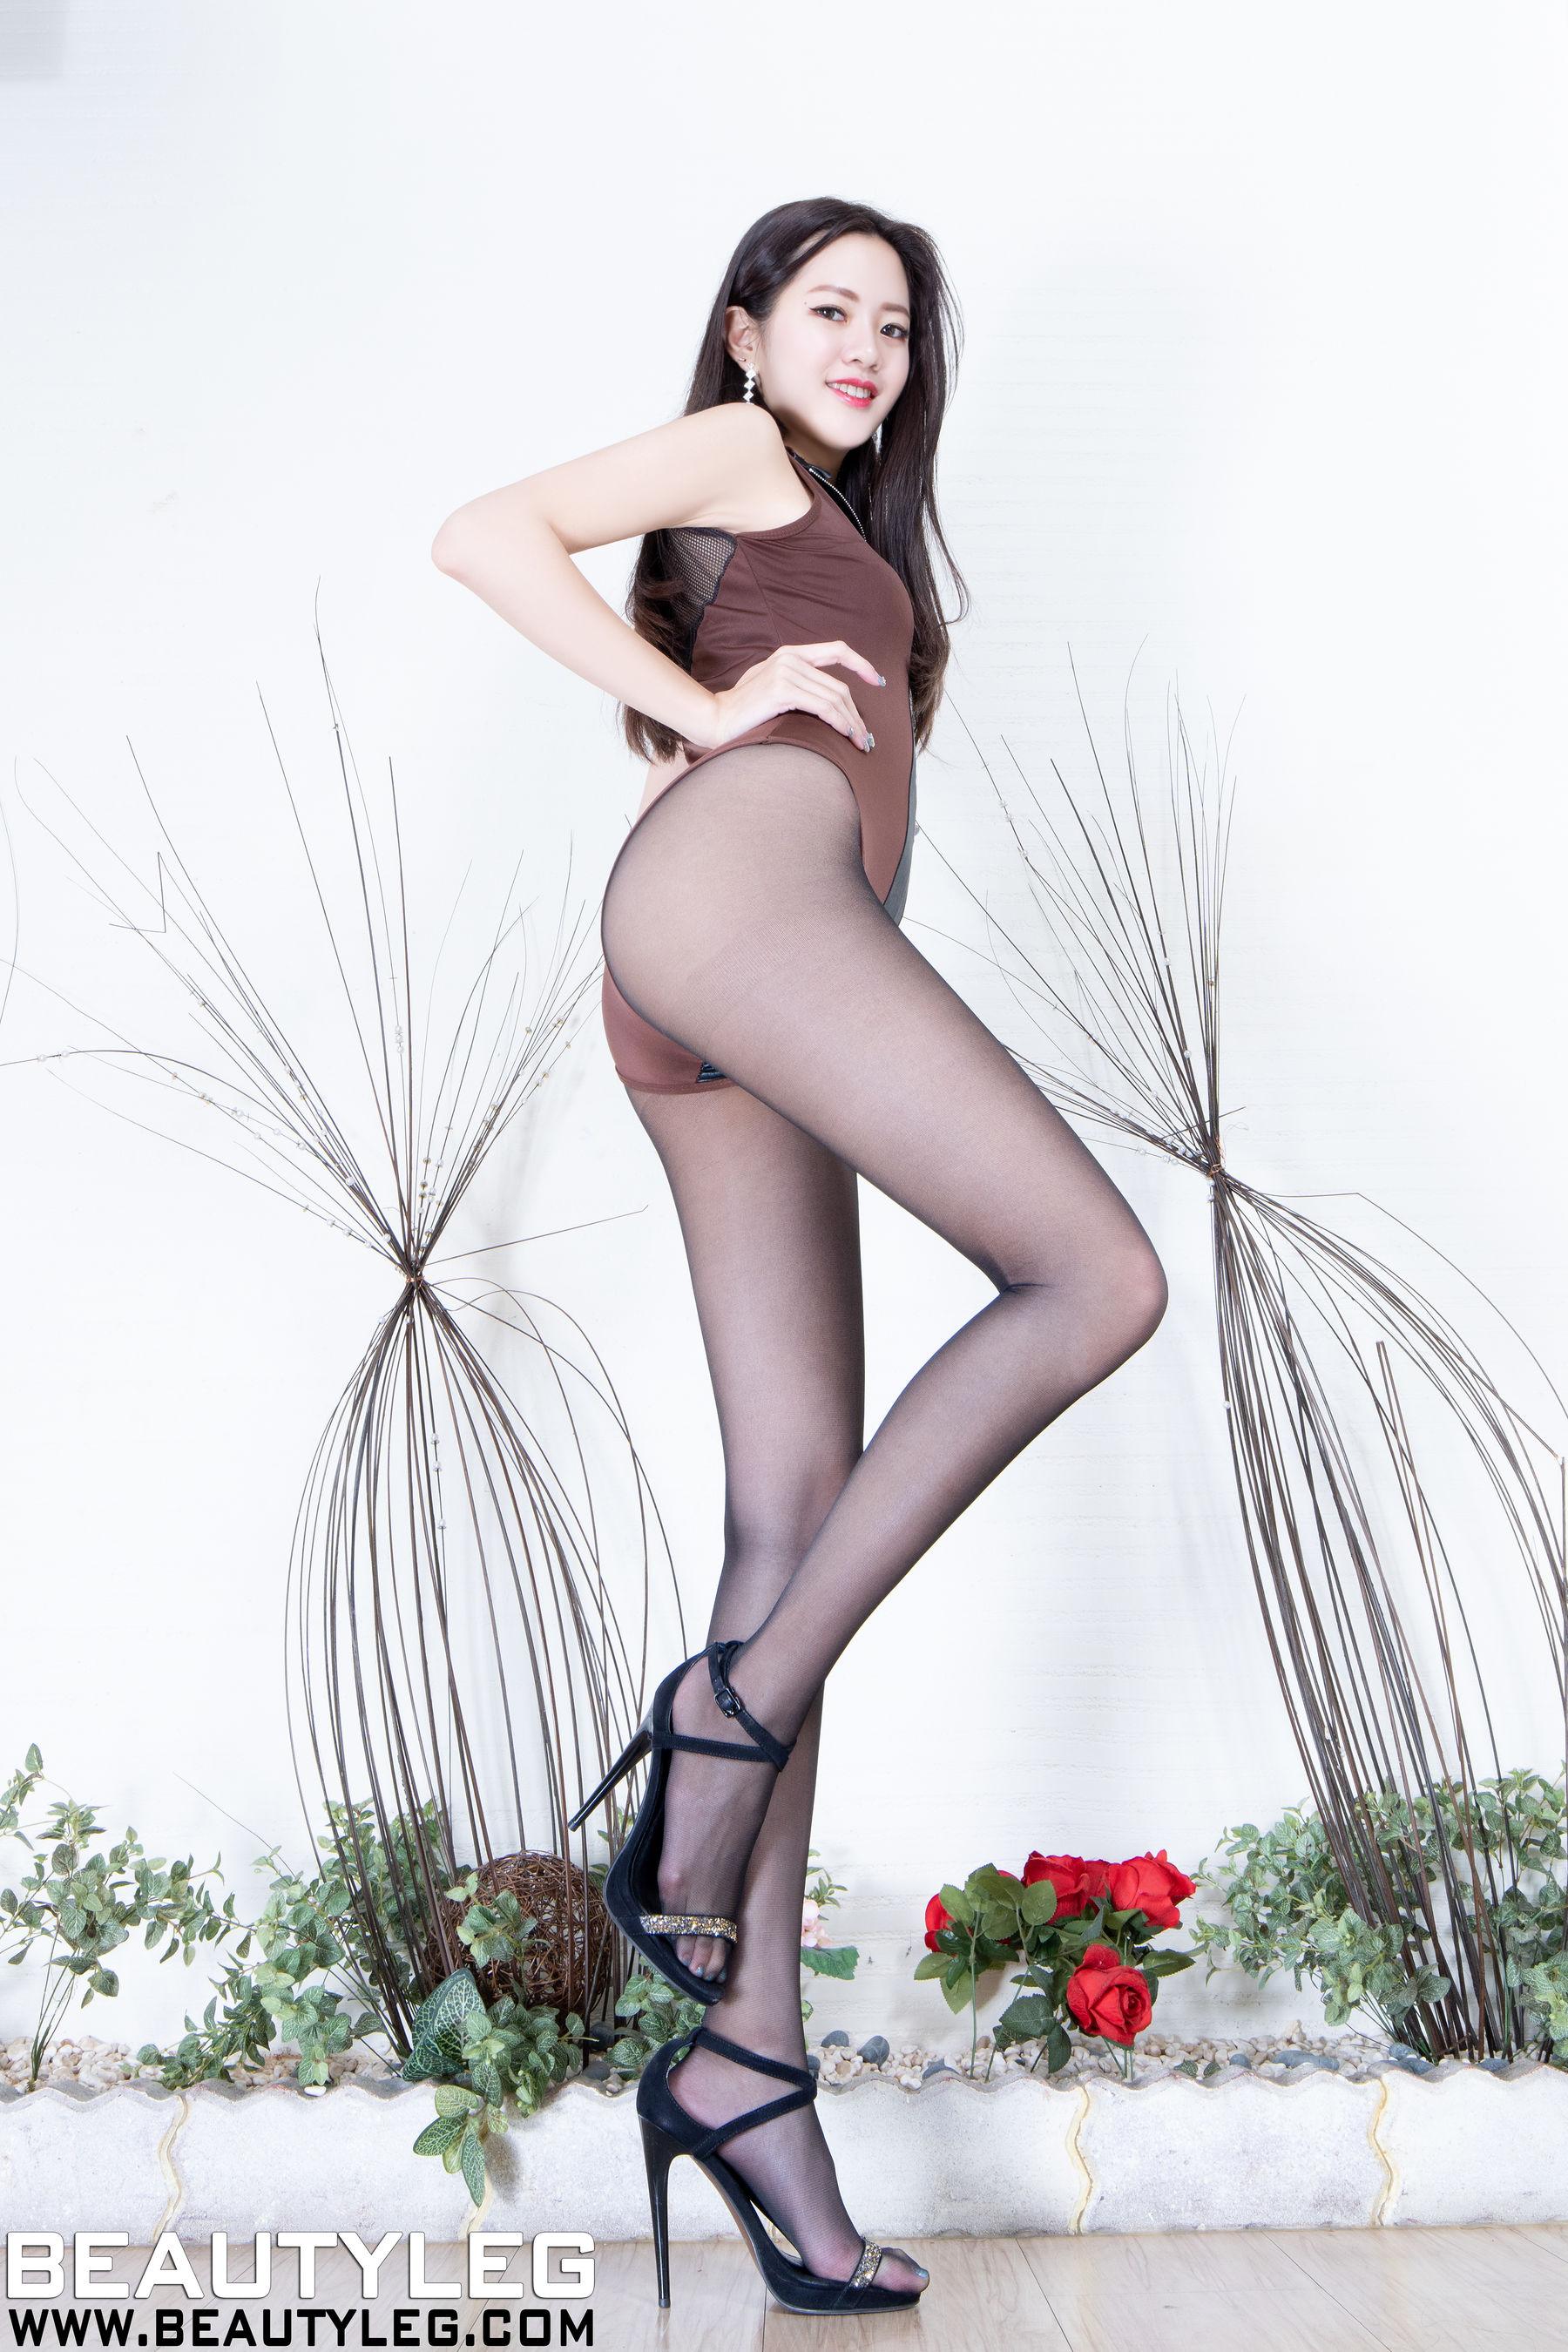 VOL.1090 [Beautyleg]黑丝美腿:腿模Una(Beautyleg Una)高品质写真套图(26P)